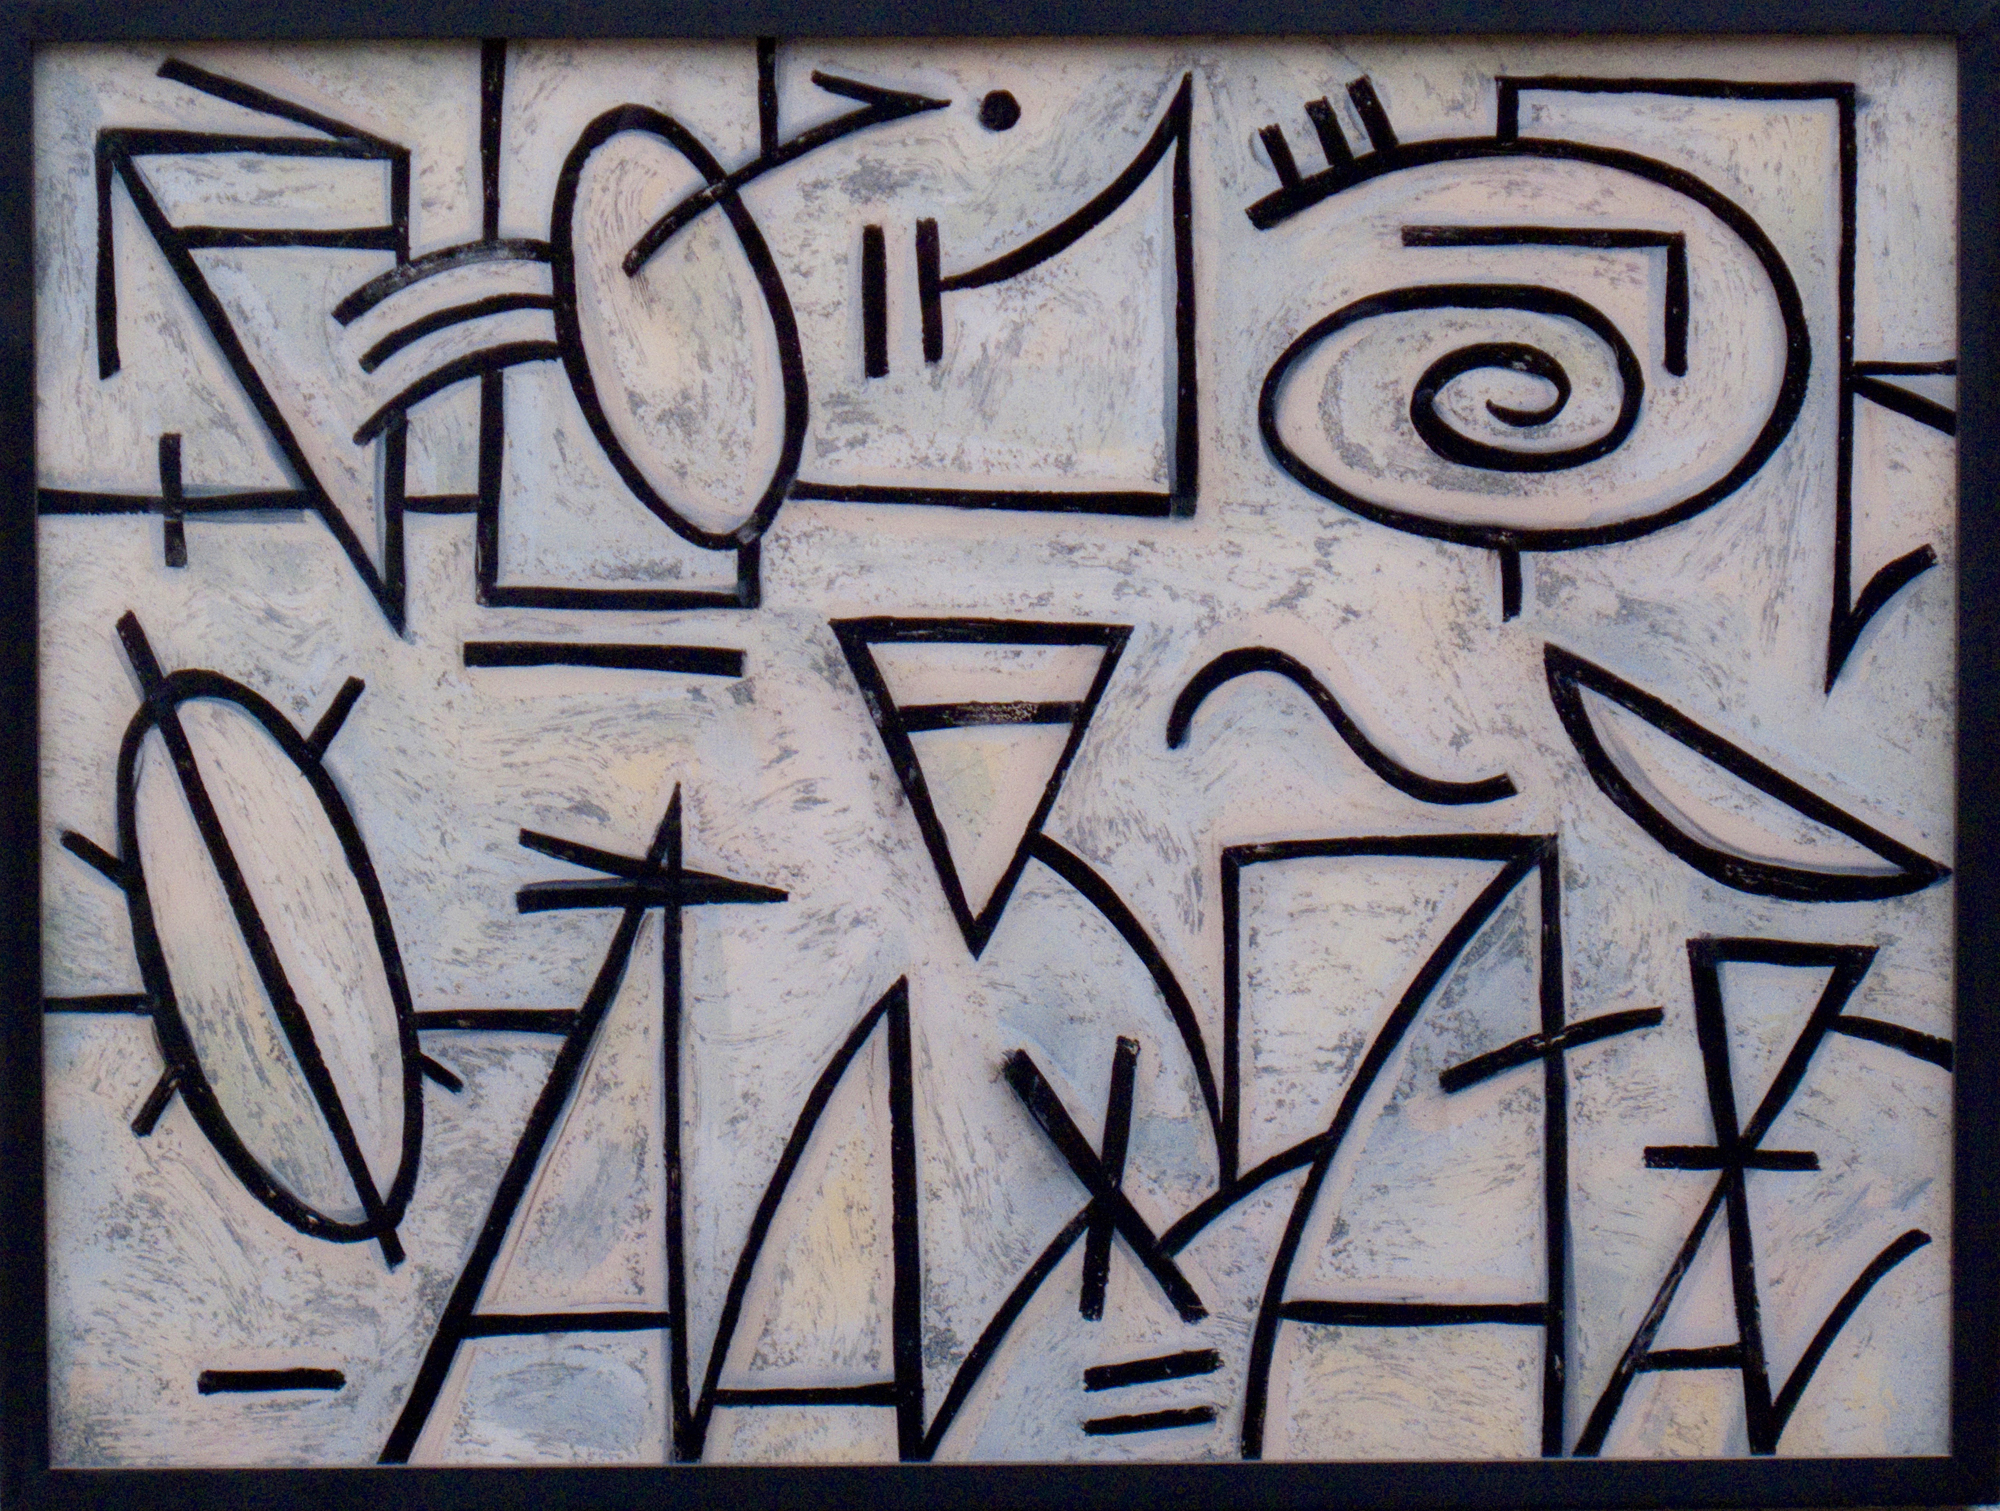 Cityghlyph